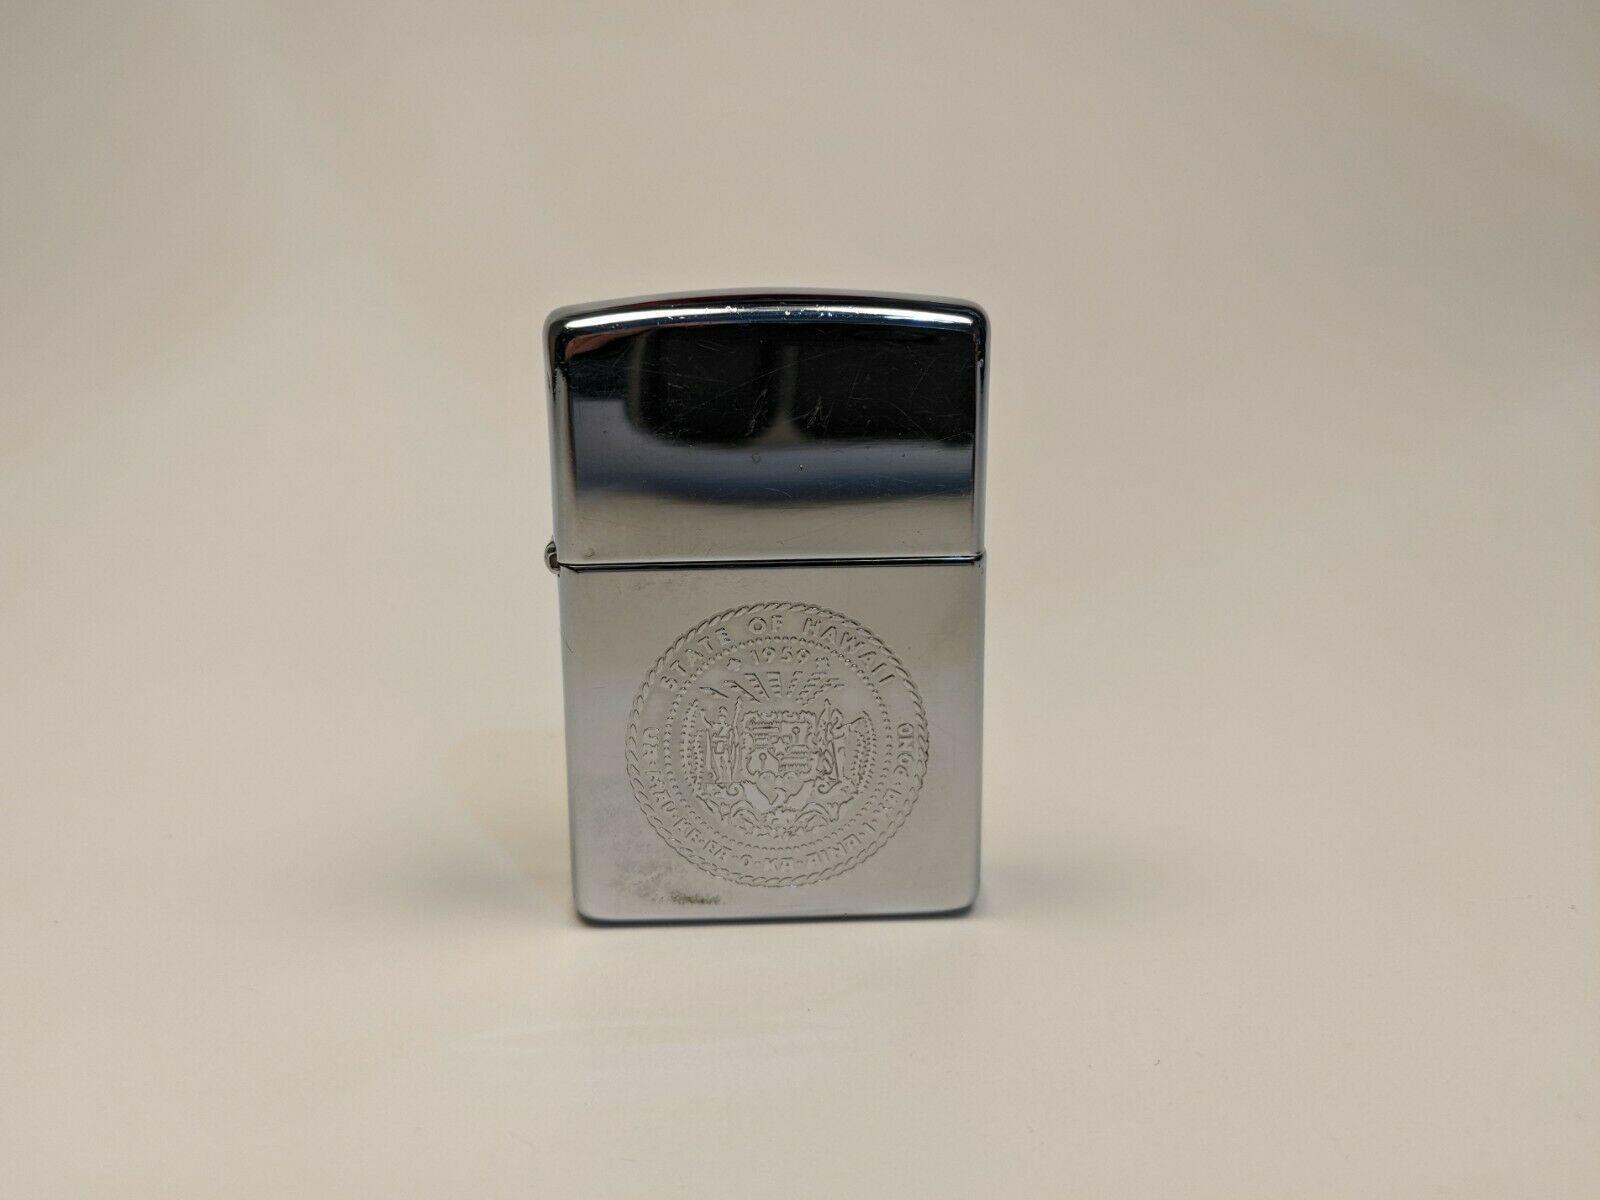 Zippo Lighter Hawaii State Seal Rare Vintage 1995 Bradford Pa Chrome Buy Hawaii Ebay In 2020 Zippo Lighter Zippo Chrome